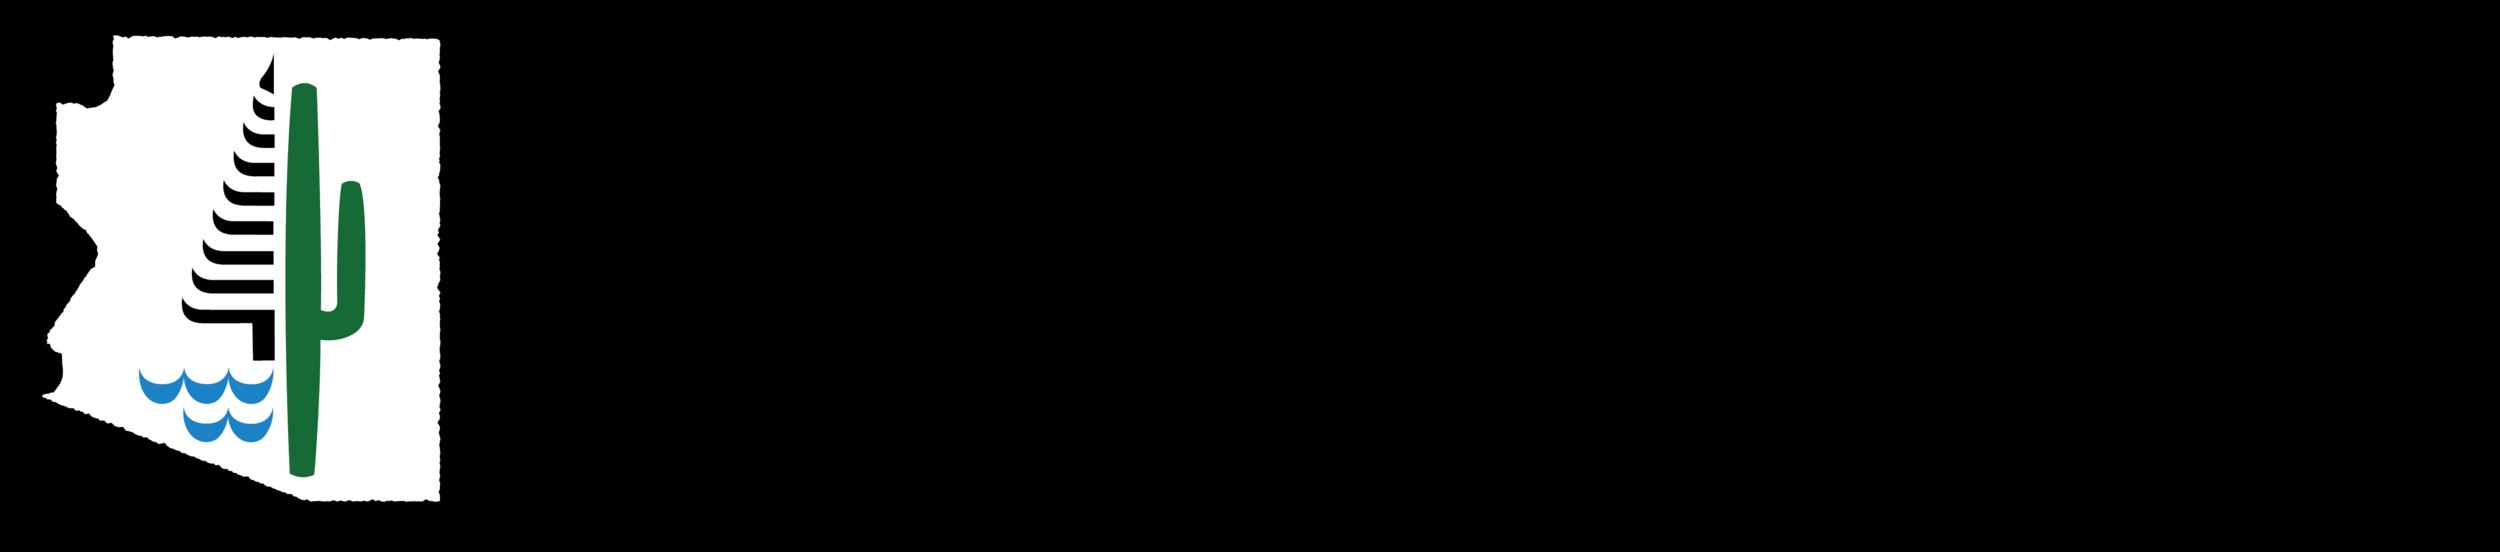 ASPLogo_Horizontal_ALT-01 2.png